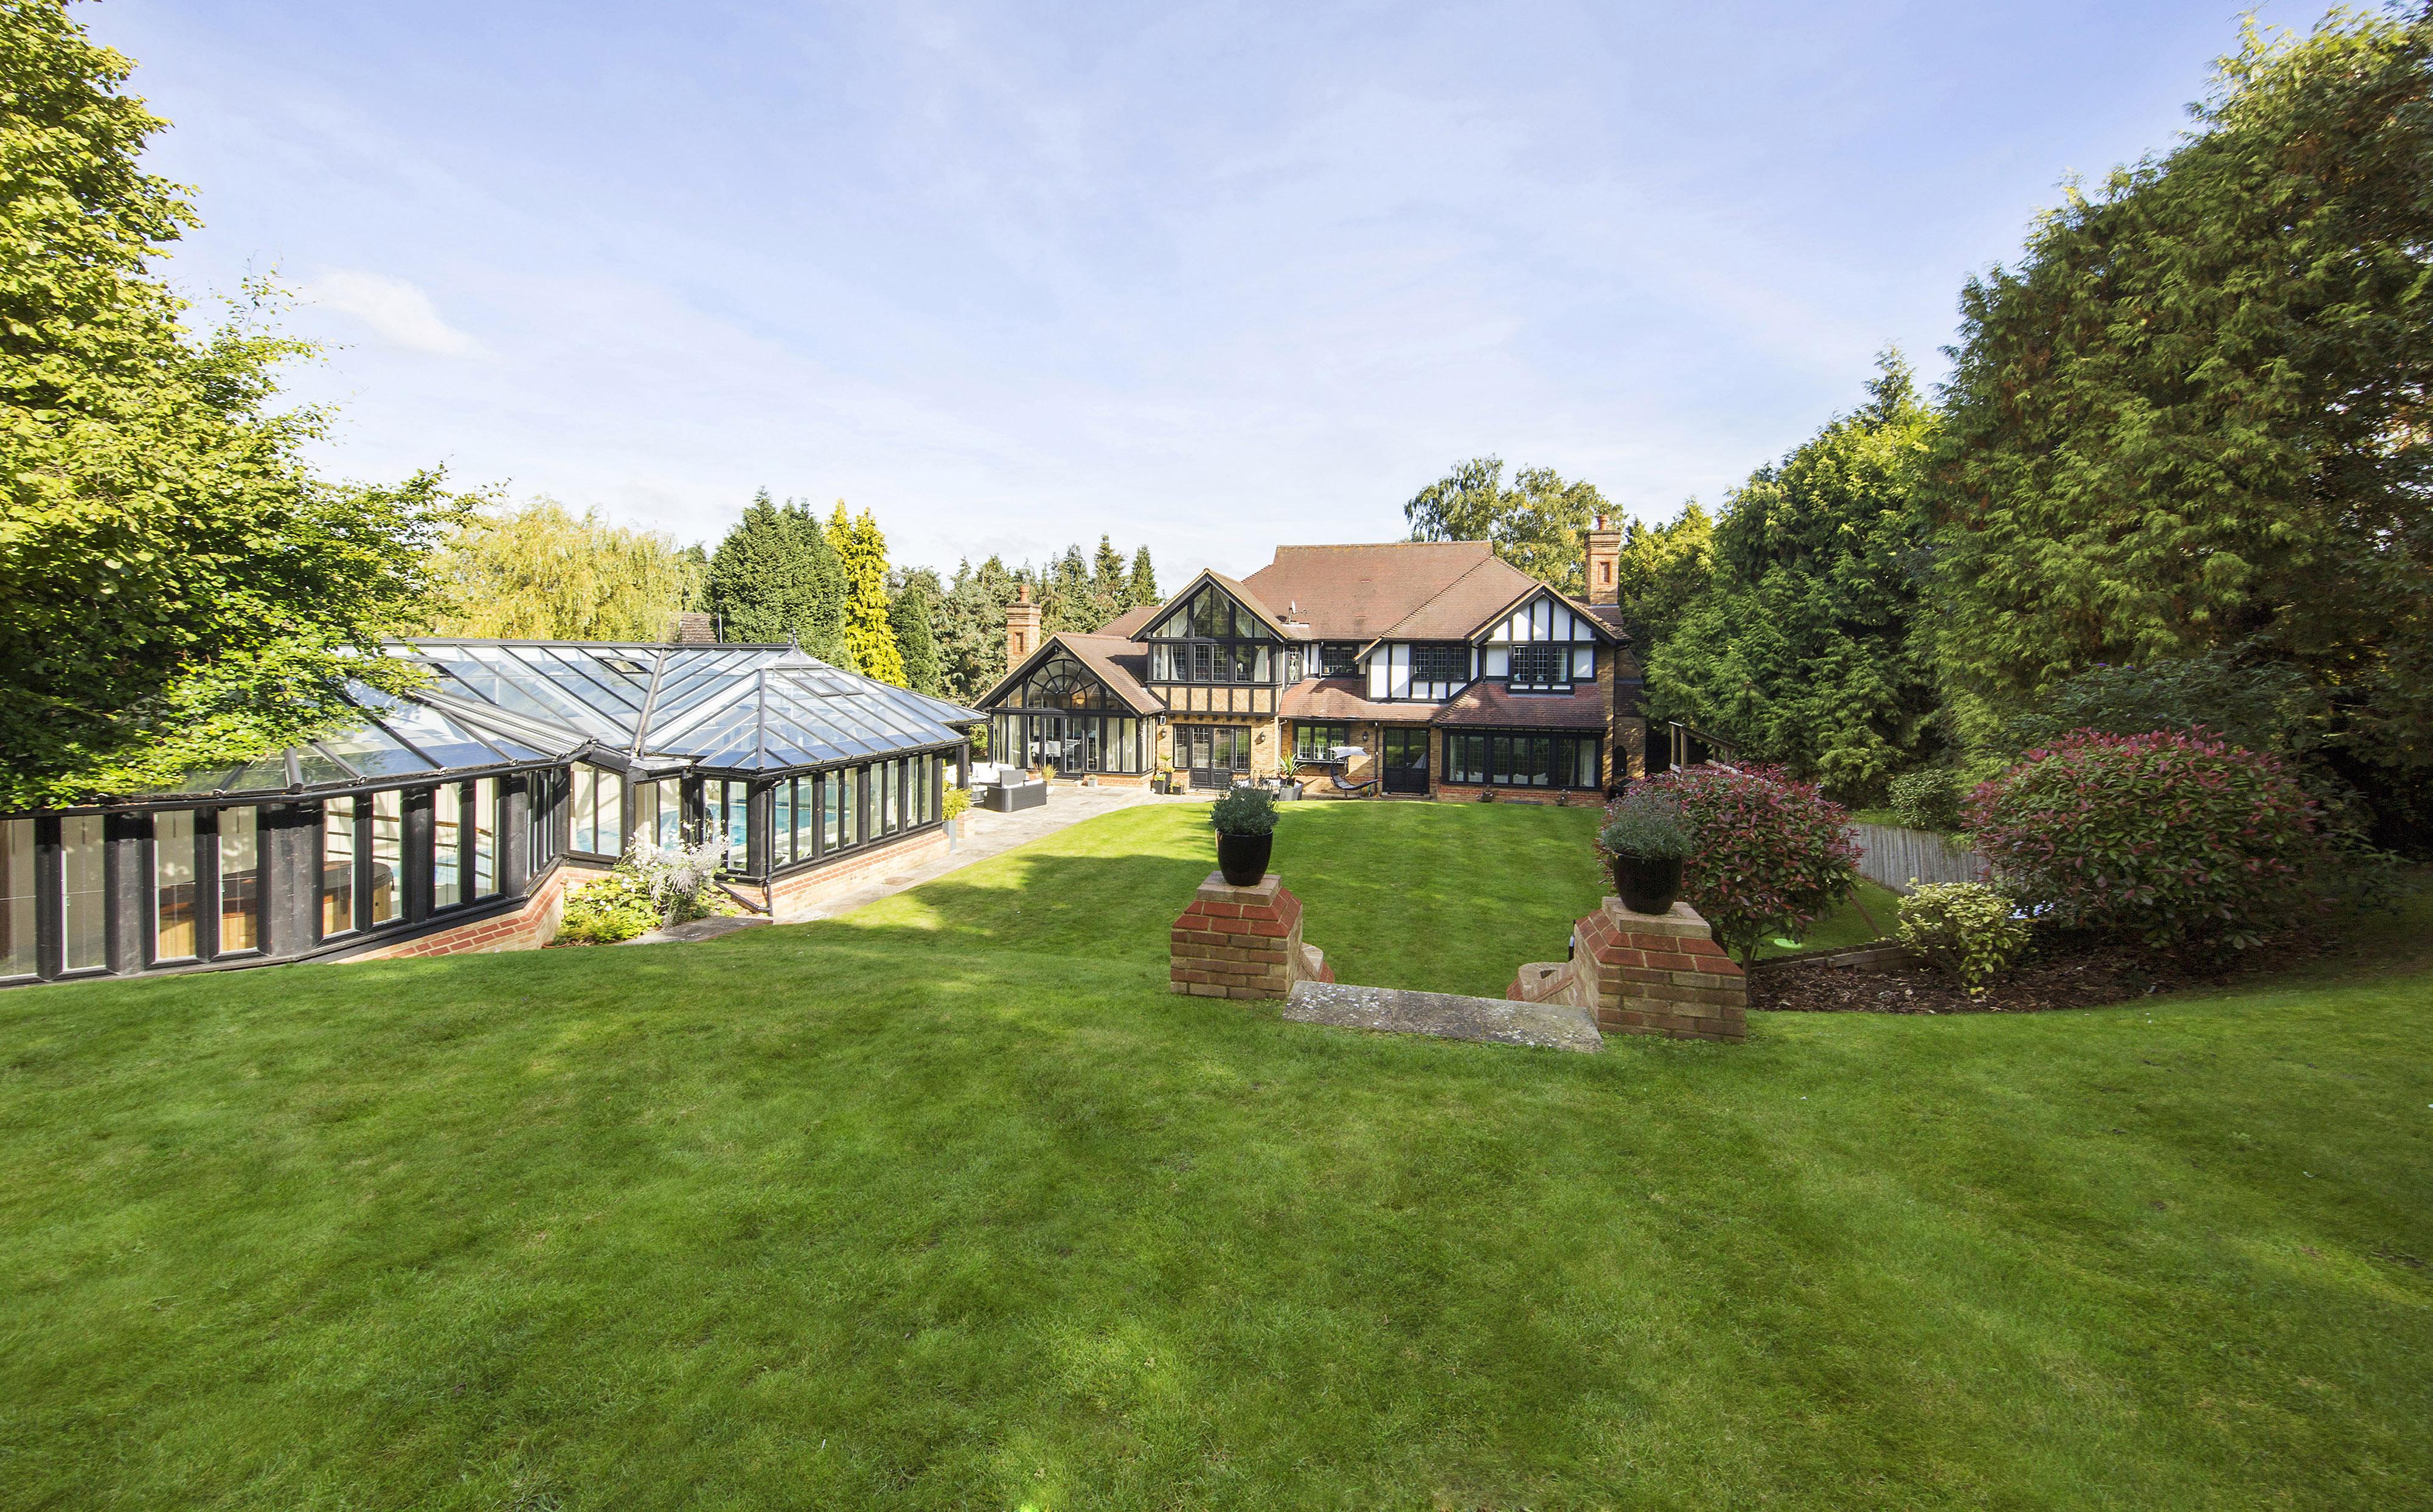 Single Family Home for Sale at Ashtead Other England, England KT211BU United Kingdom